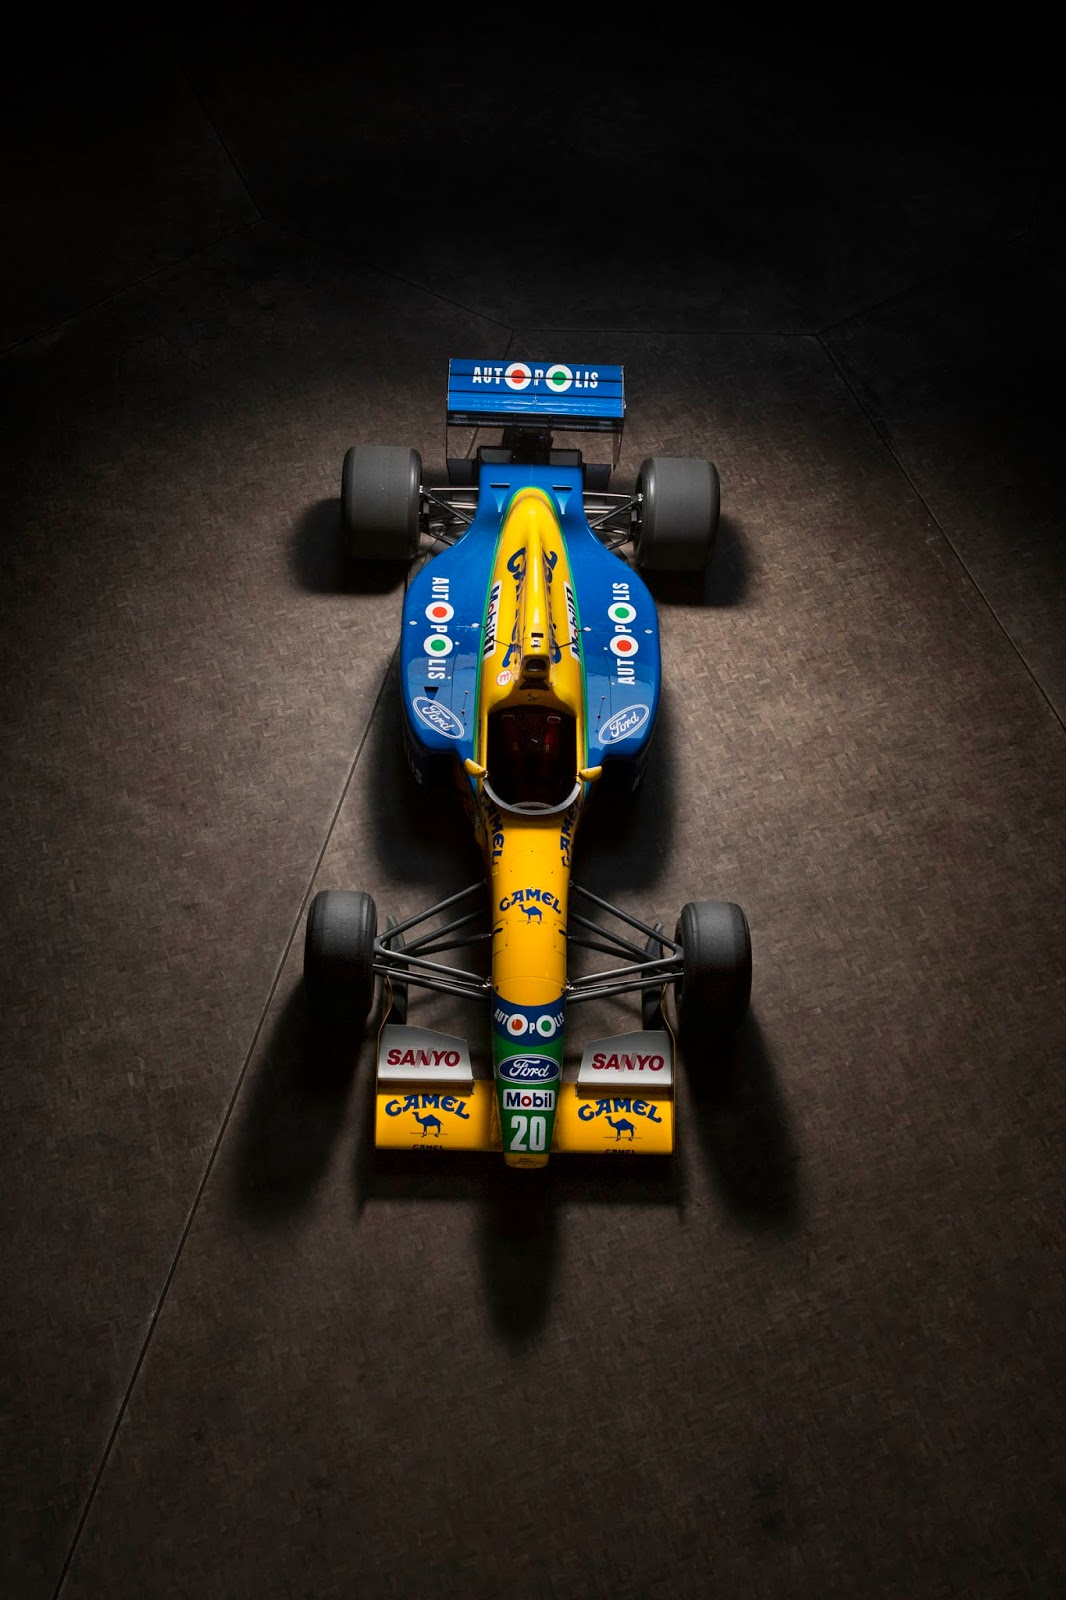 1991_Benetton-Ford_B191_14